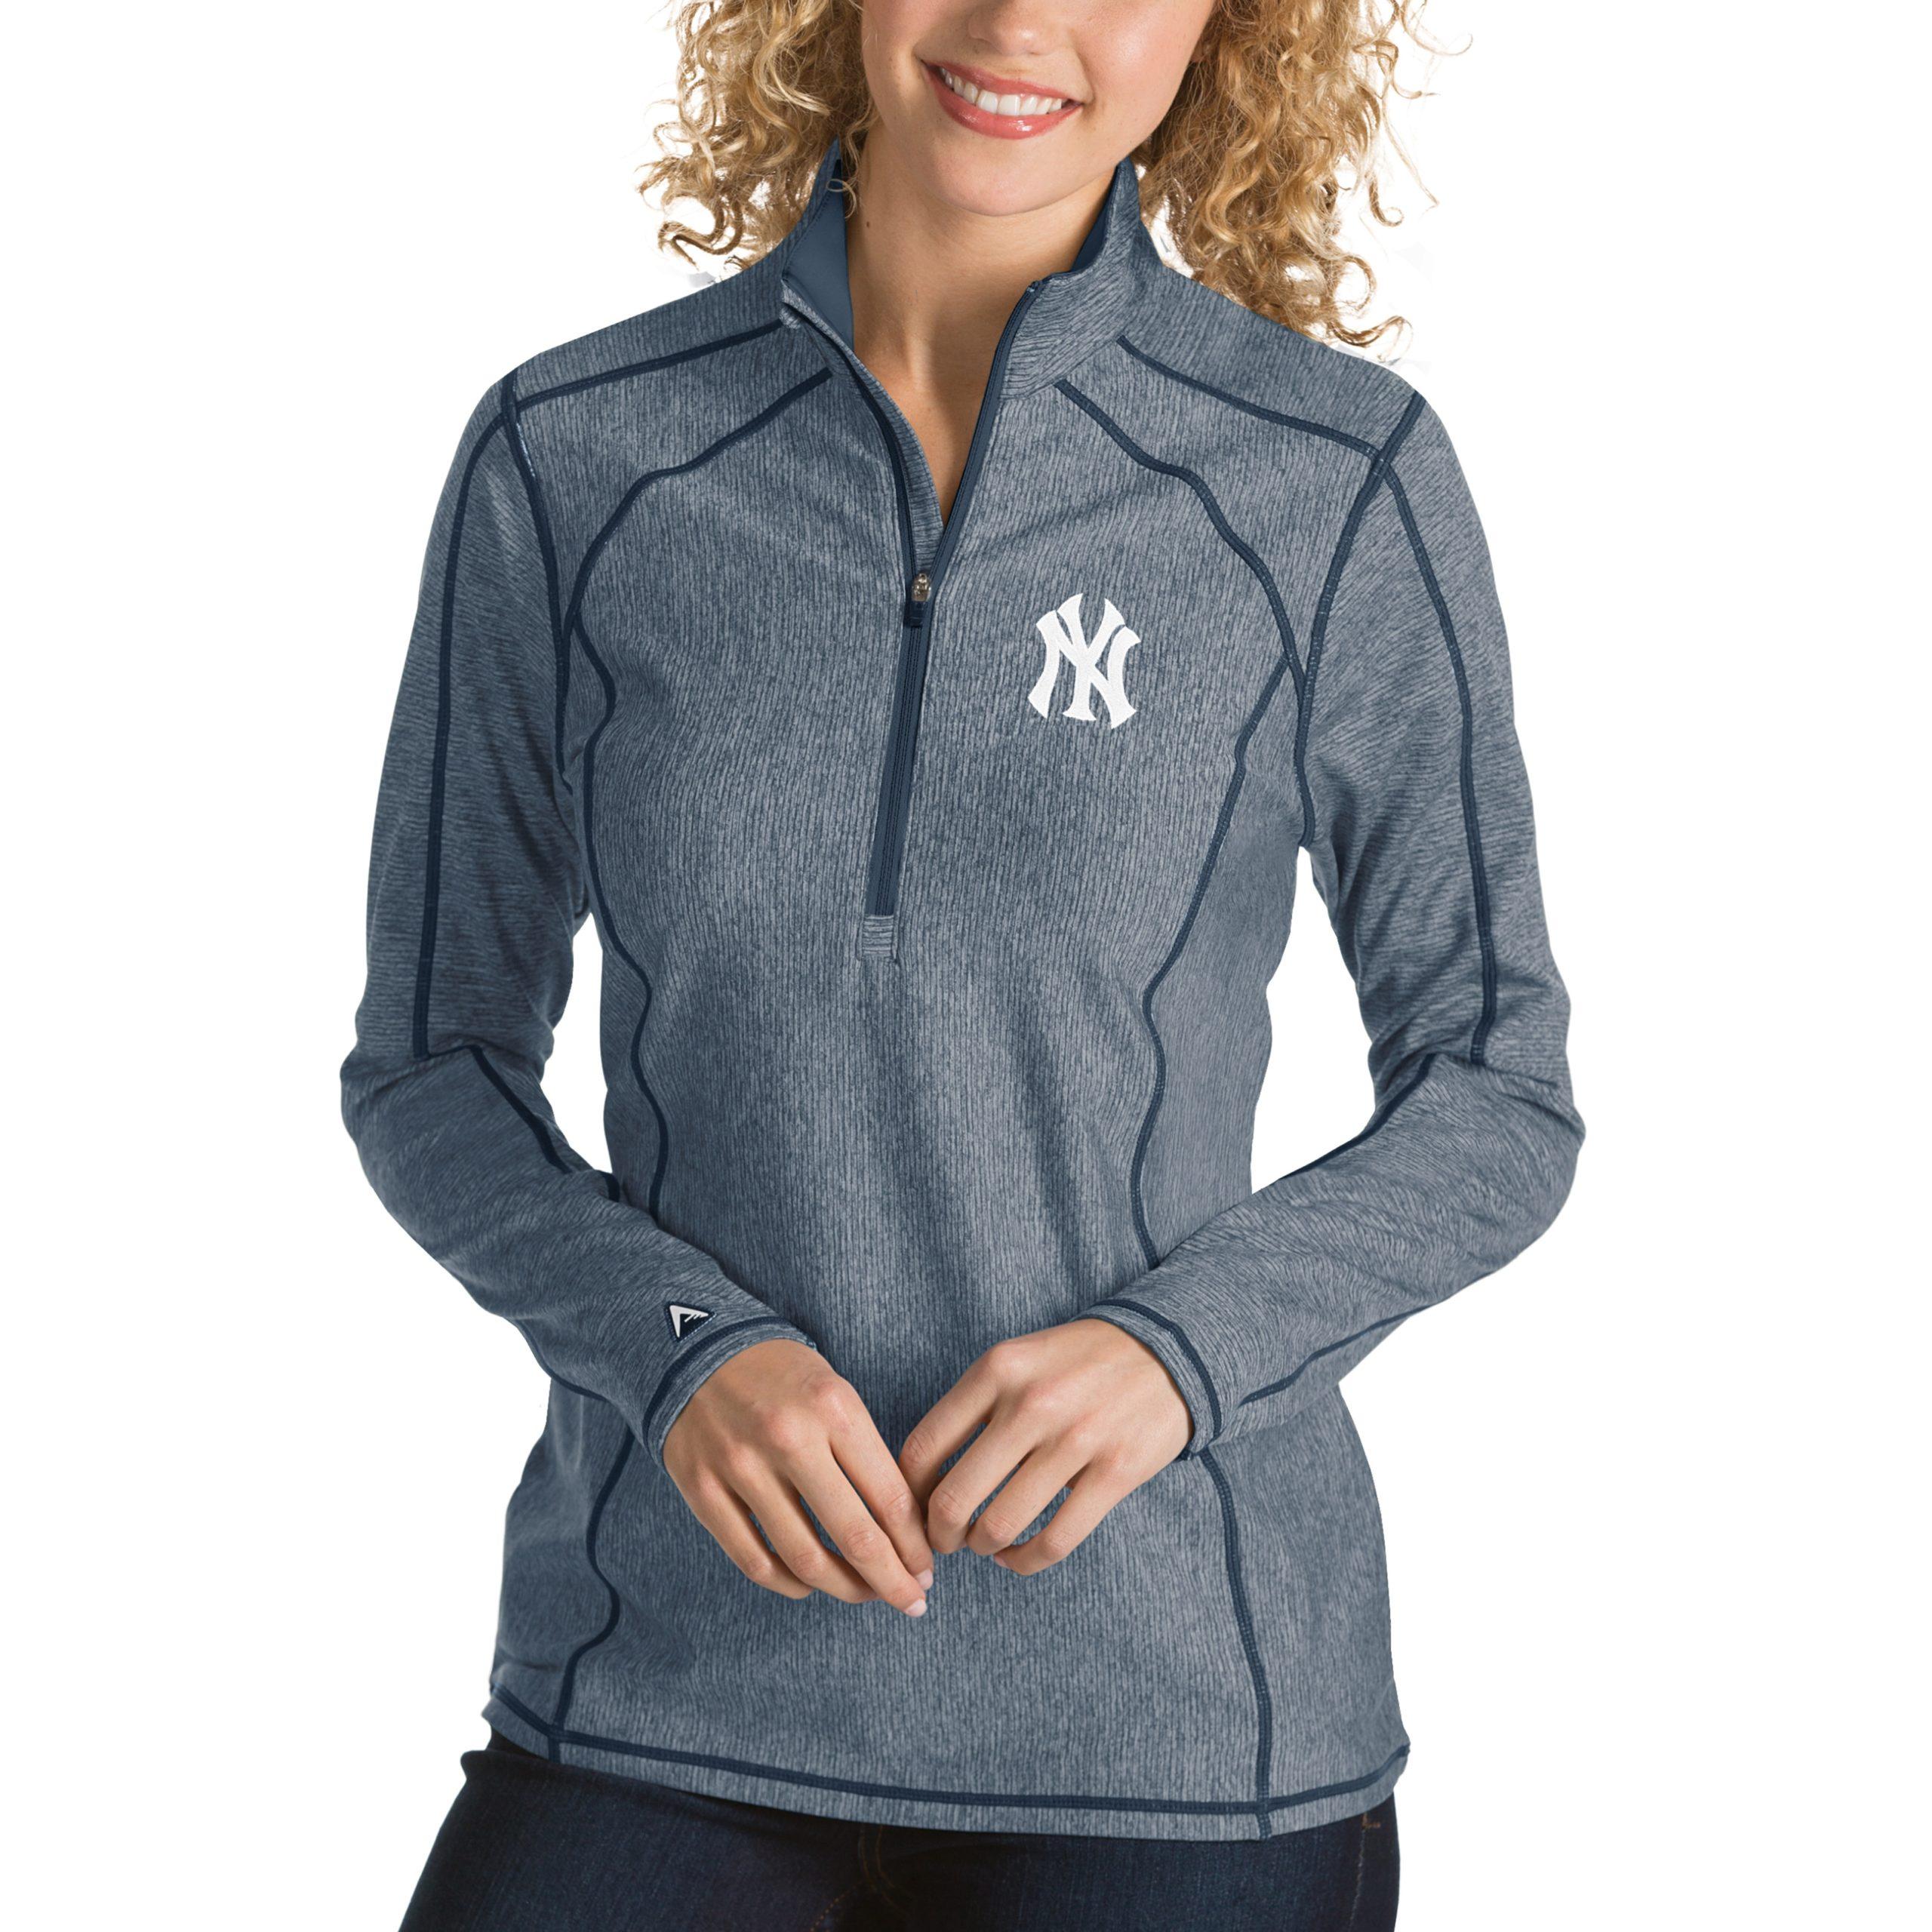 New York Yankees Antigua Women's Tempo Desert Dry 1/4-Zip Pullover Jacket - Heathered Navy